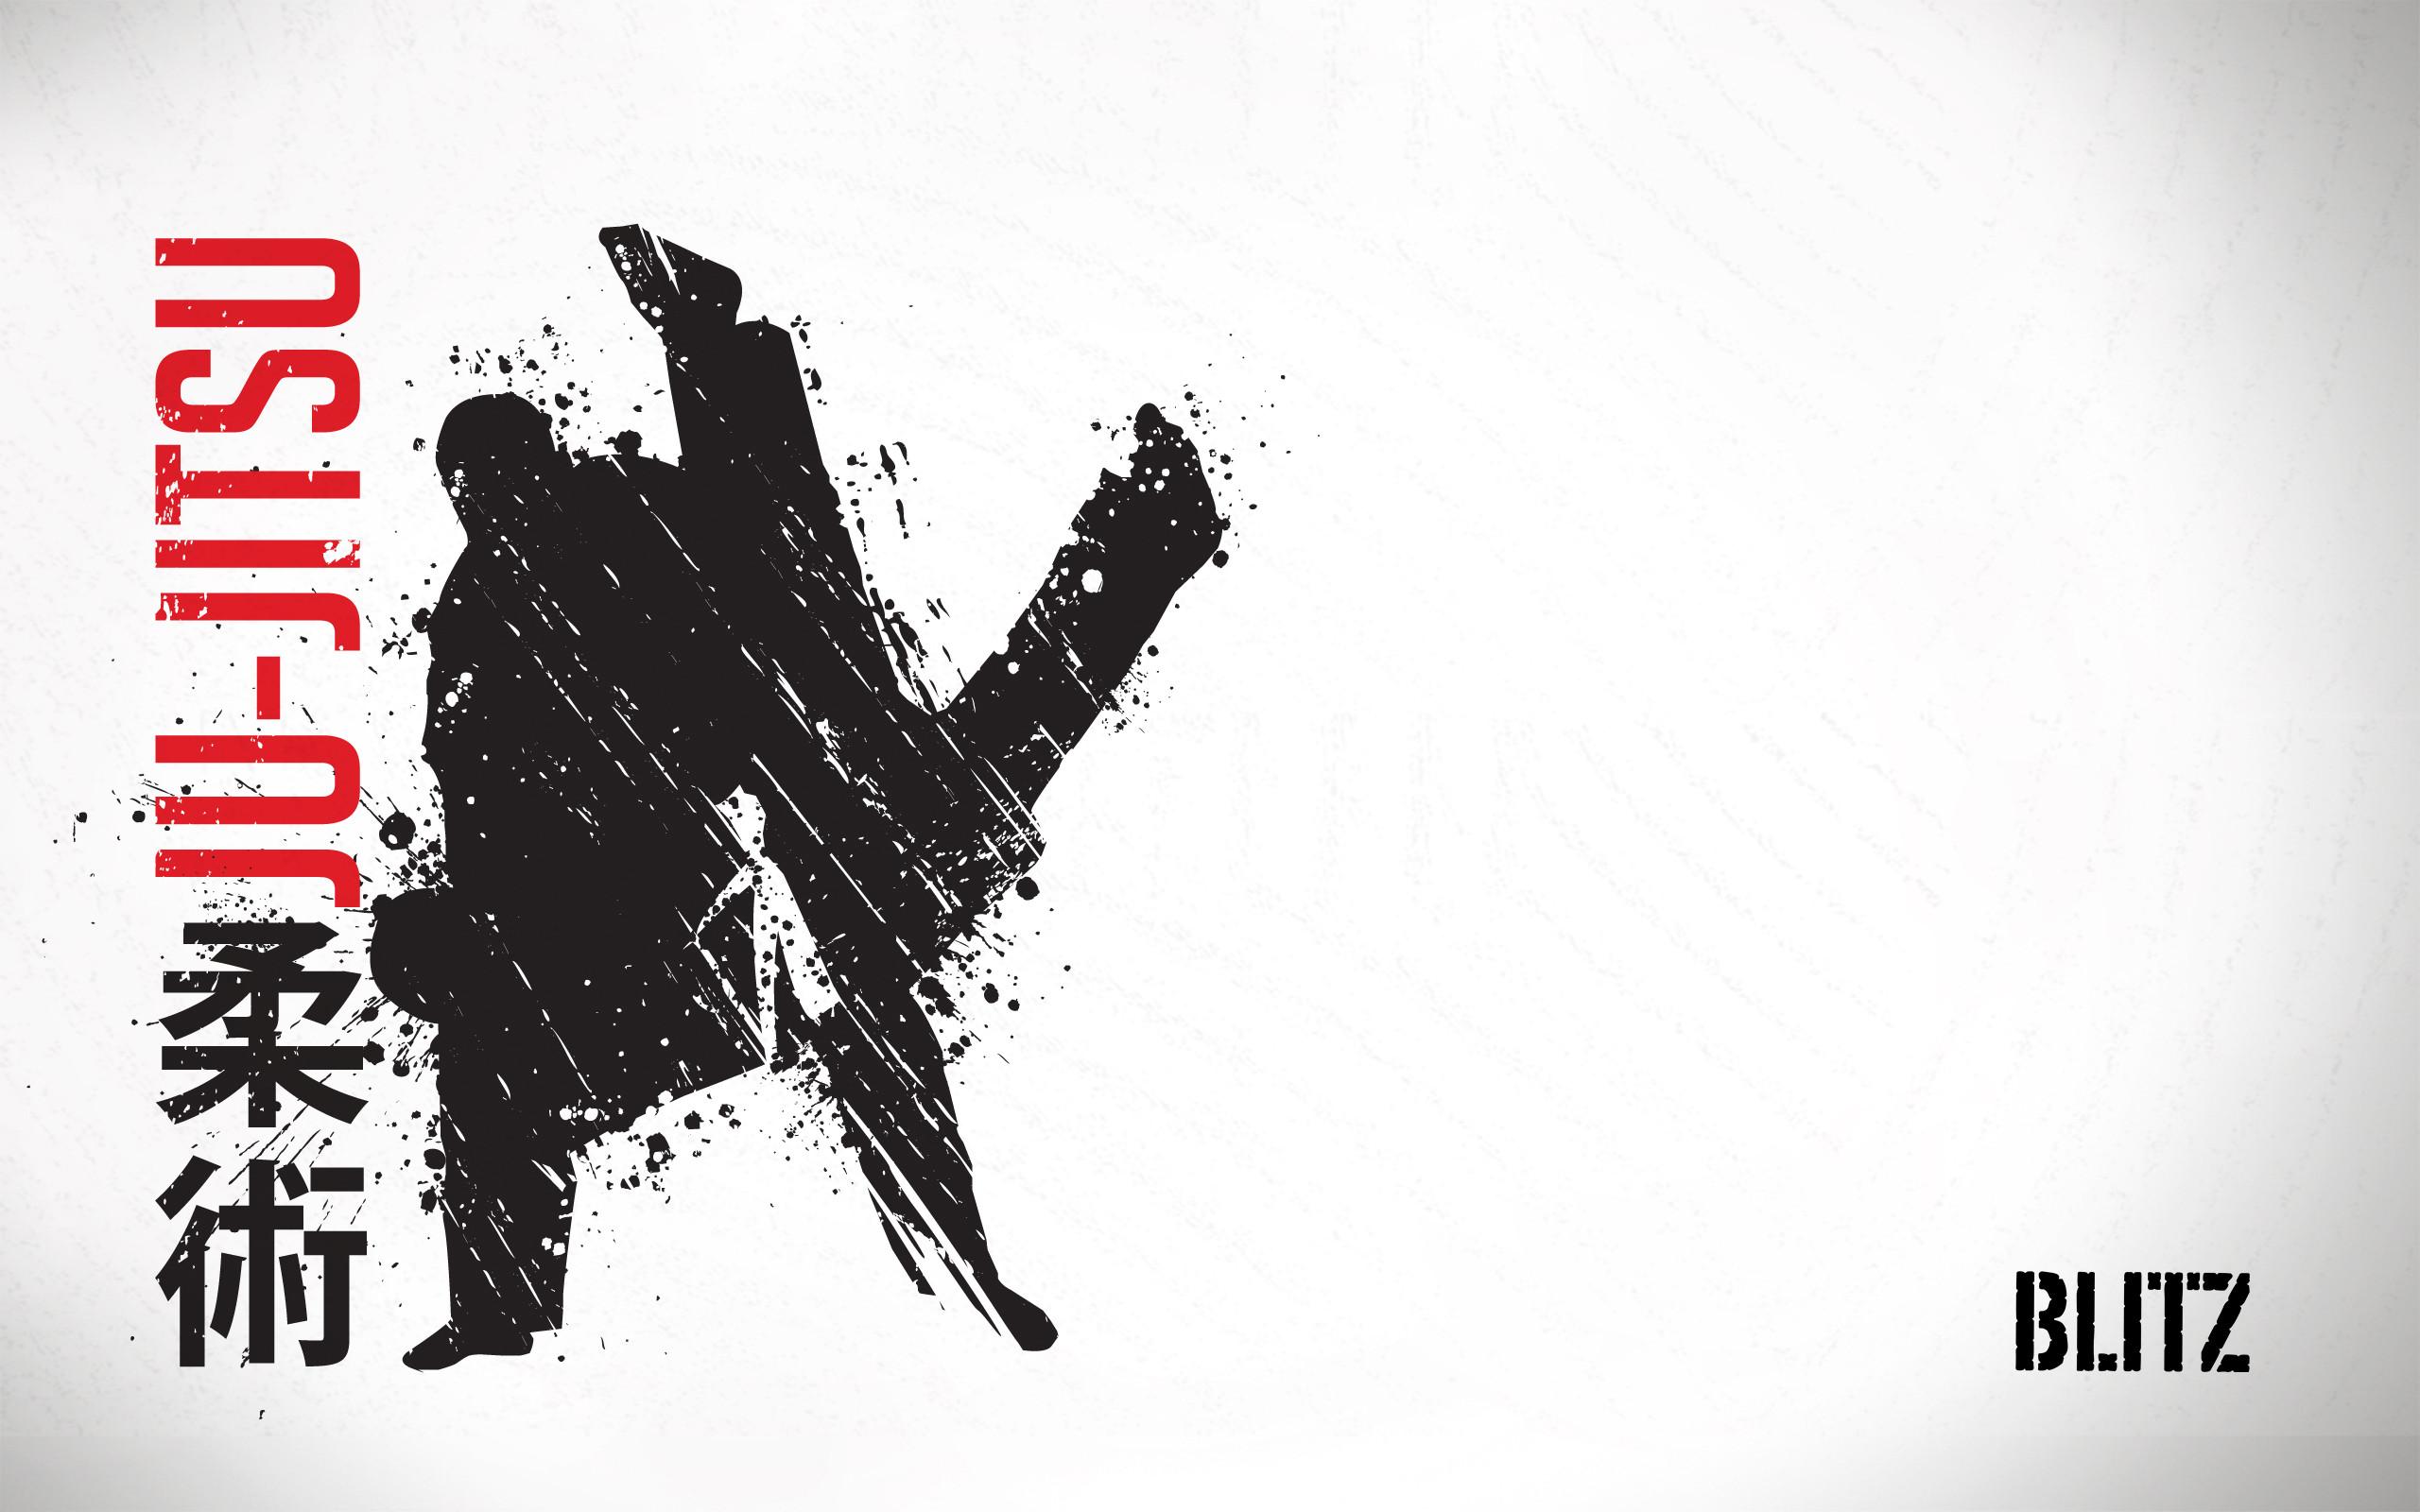 karate wallpaper (73+ images)